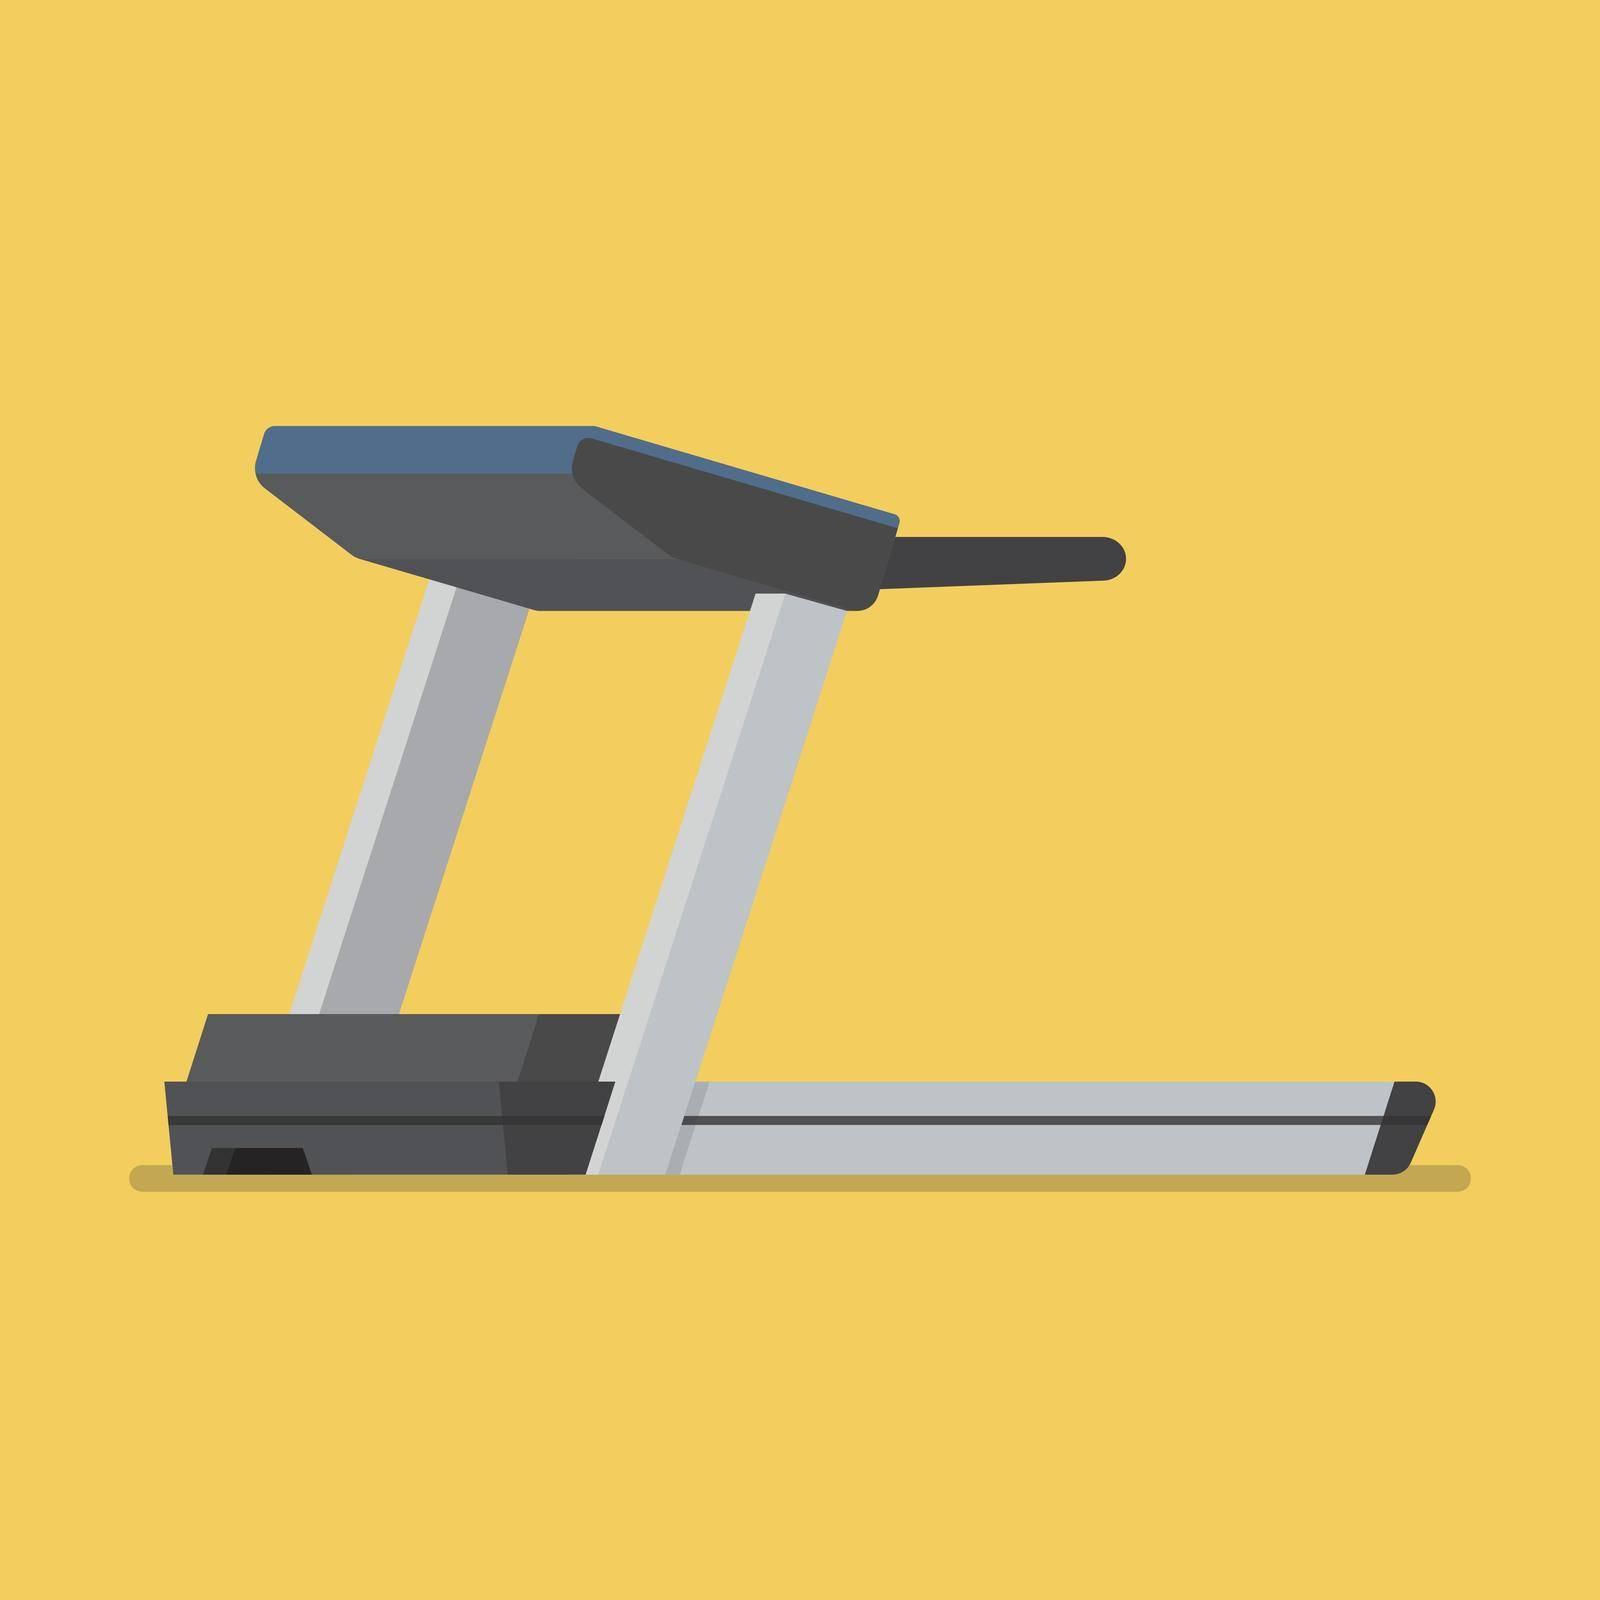 Treadmill sport equipment. Flat style vector illustration